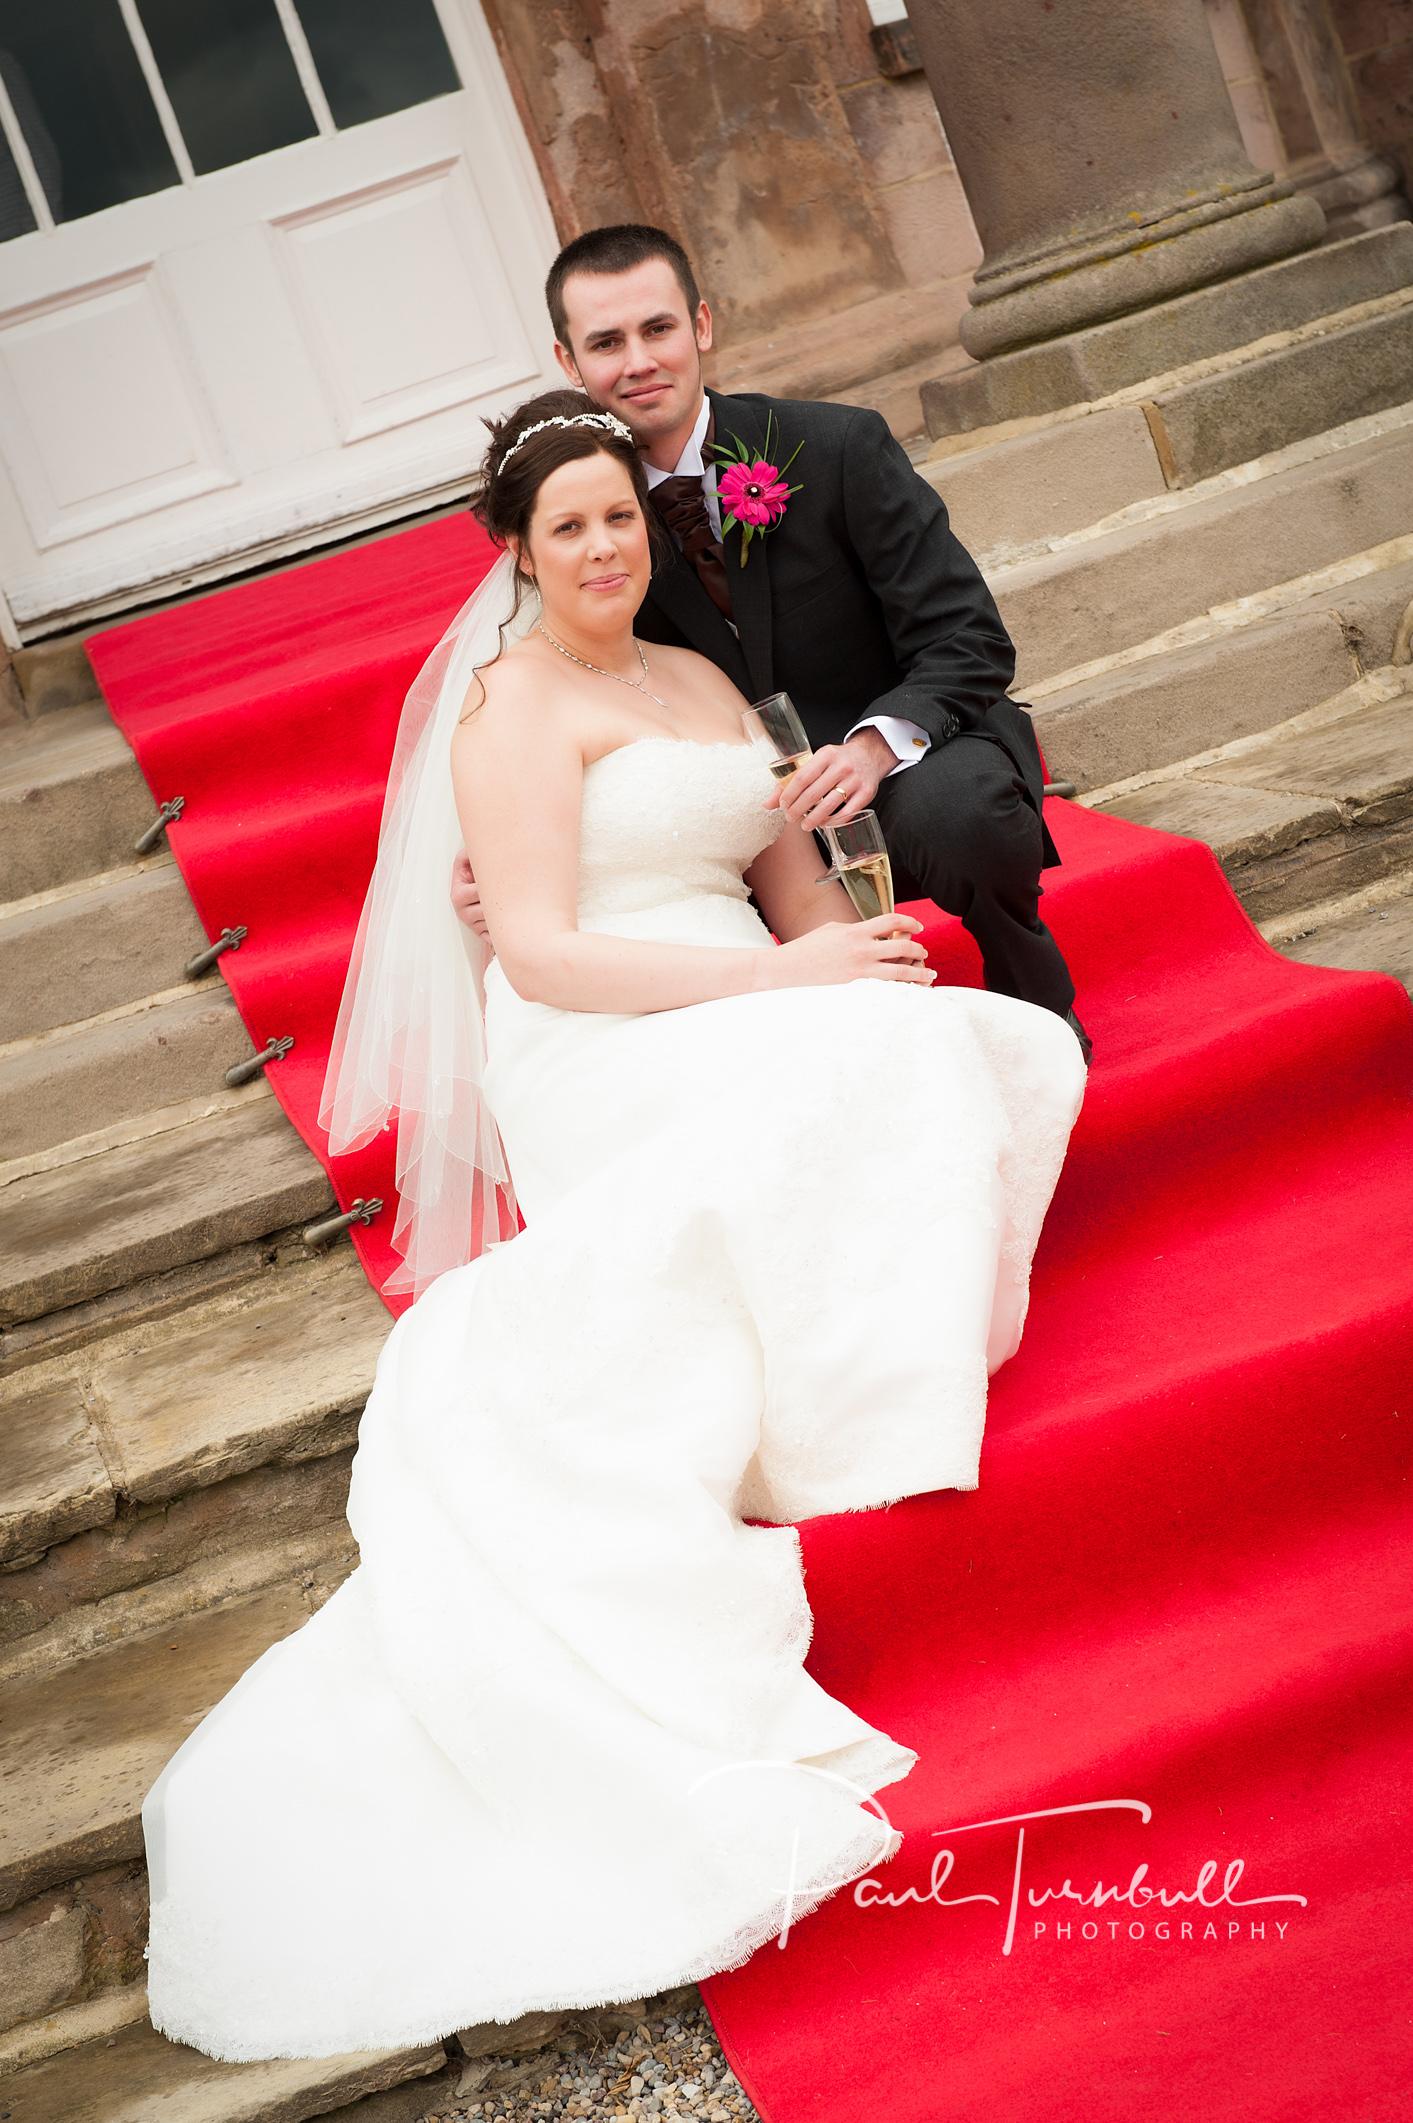 wedding-photography-wood-hall-wetherby-yorkshire-040.jpg